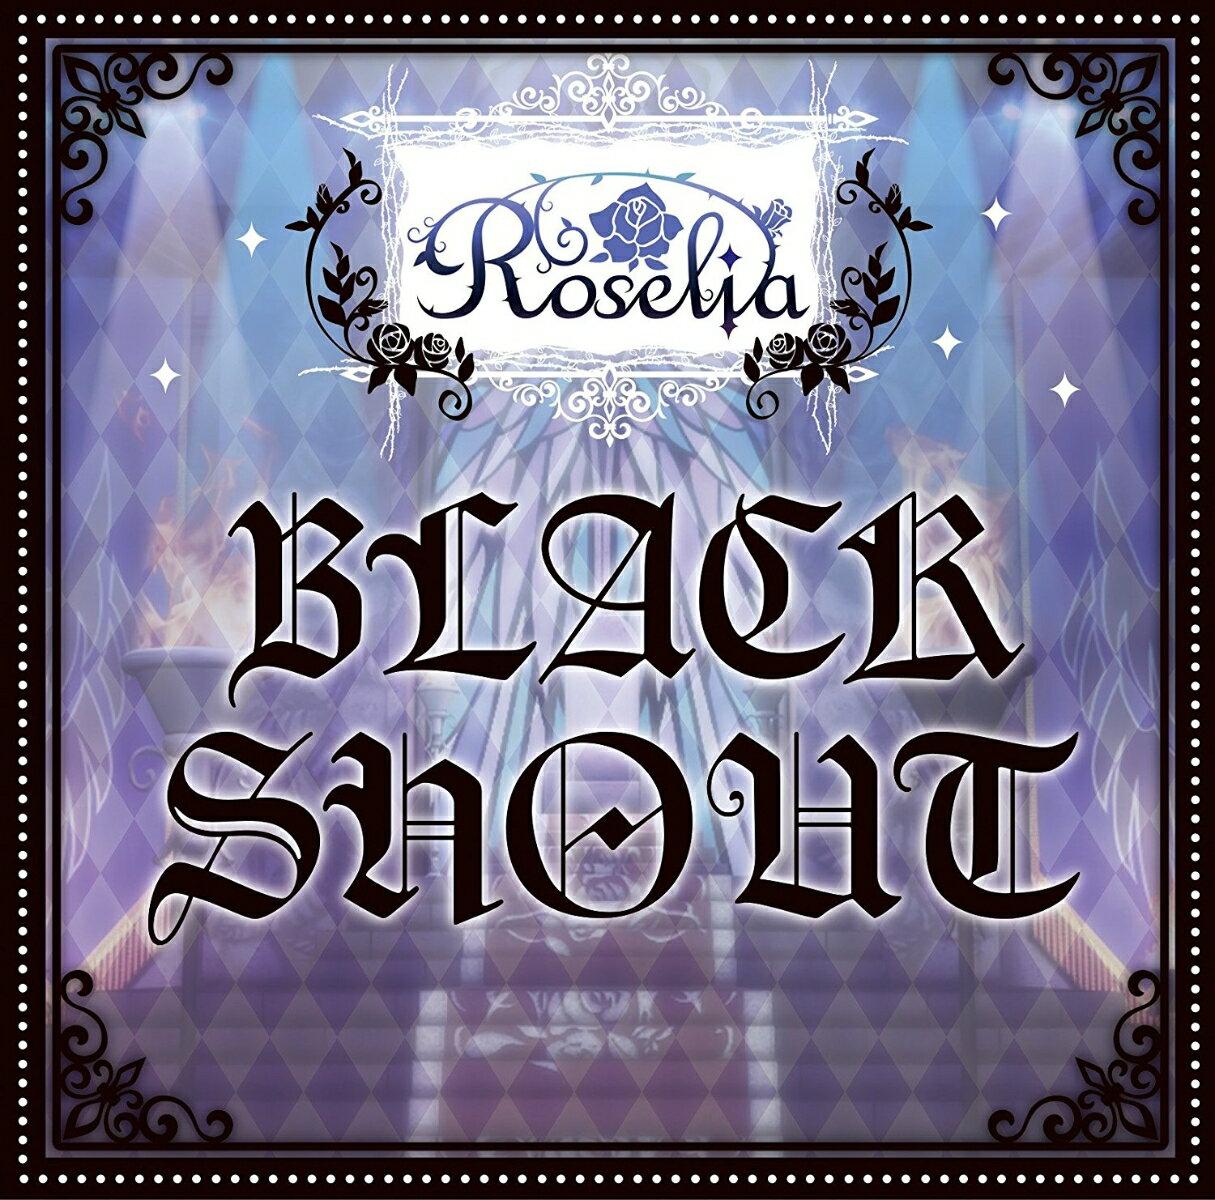 CD, ゲームミュージック BLACK SHOUT Roselia